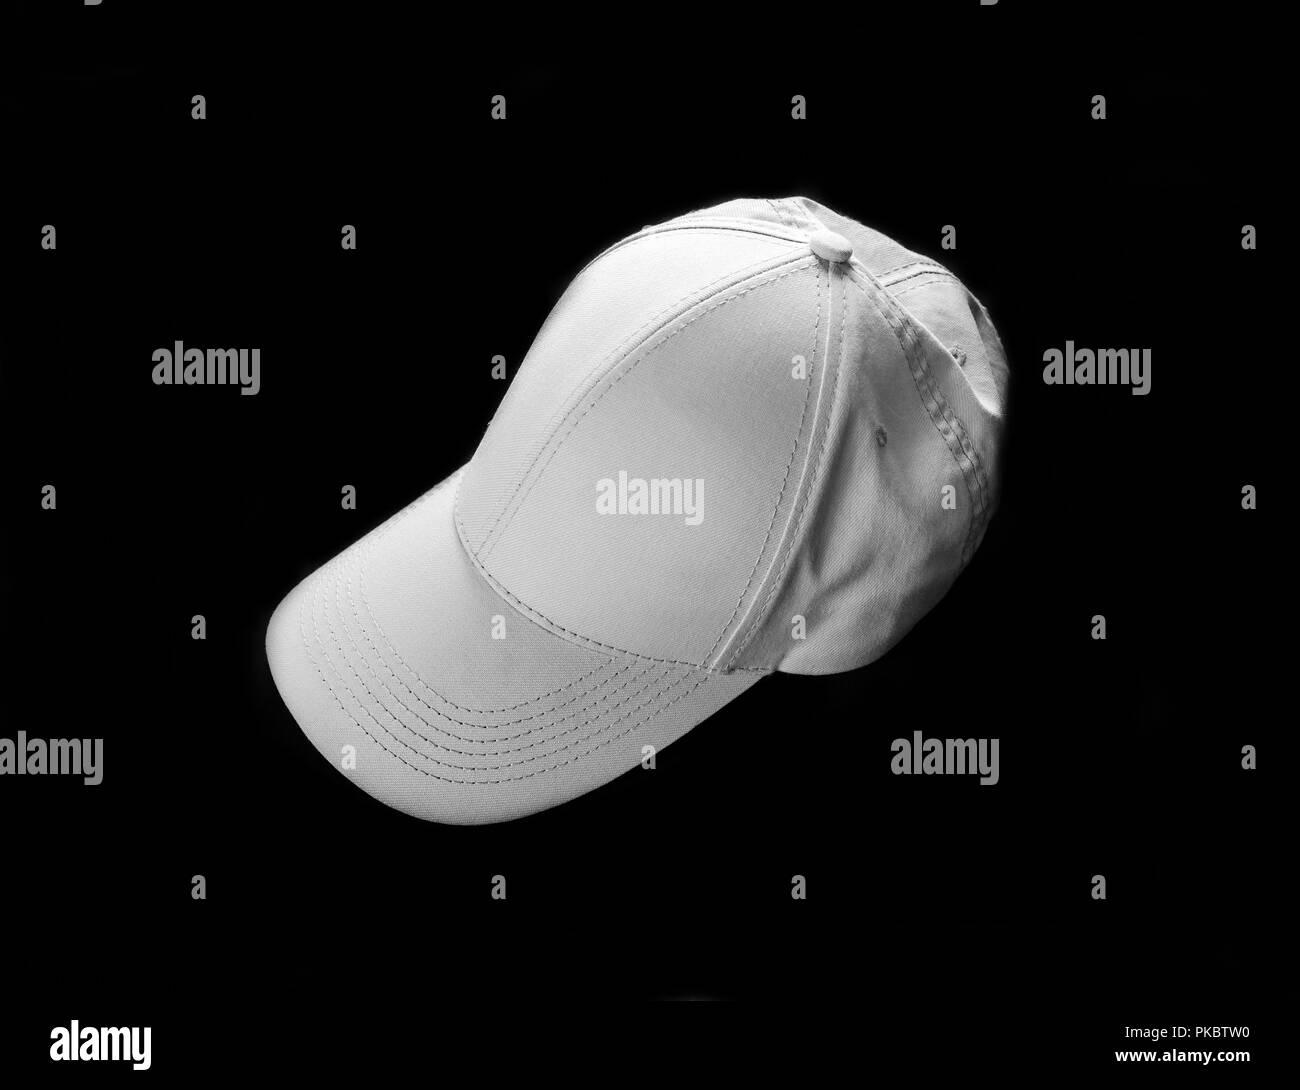 baseball cap template stock photos baseball cap template stock